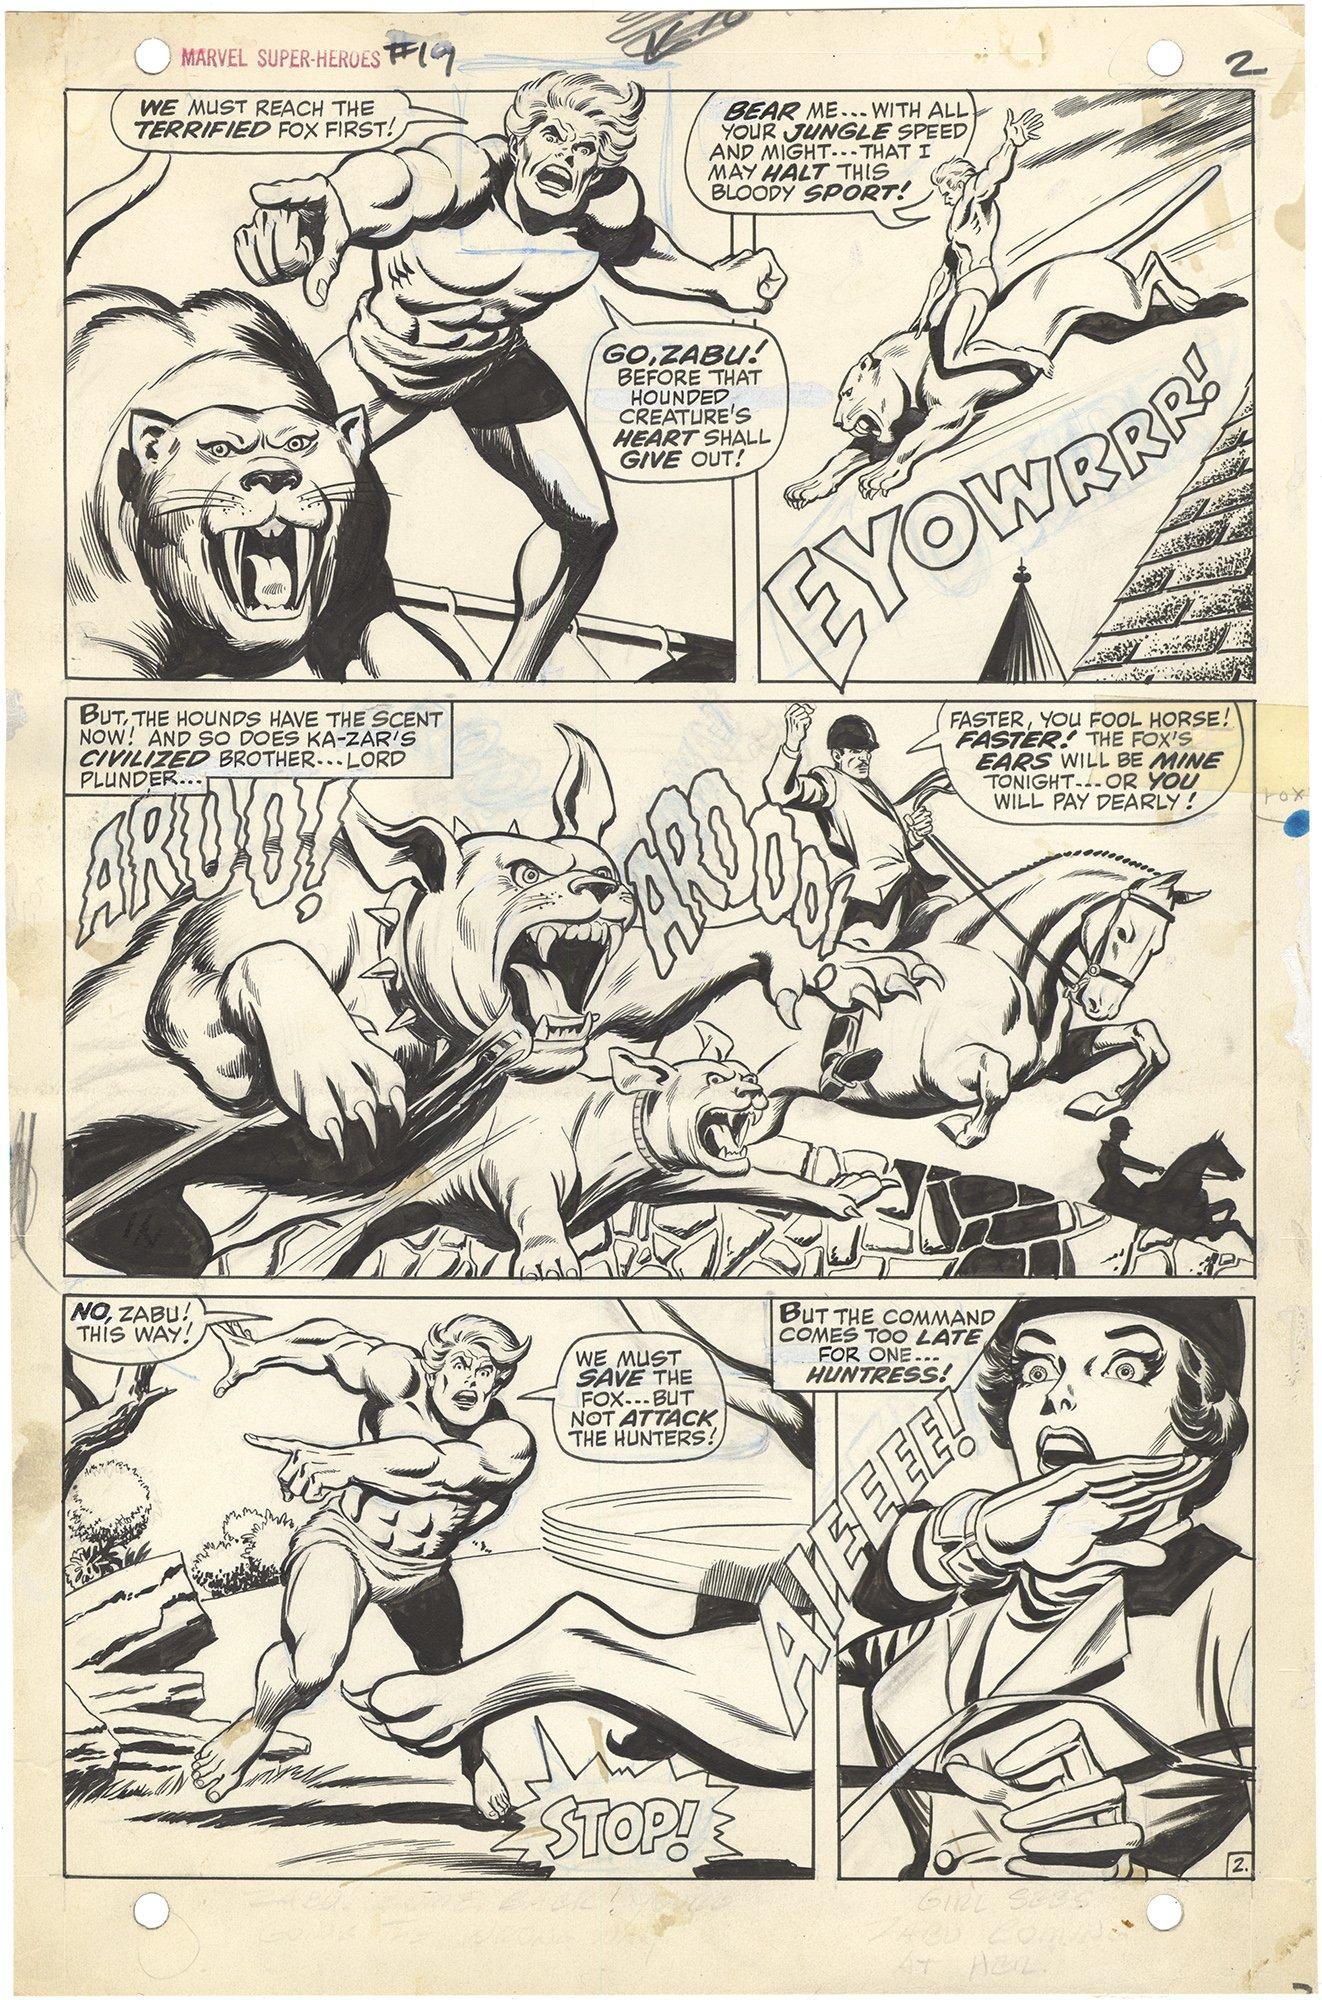 Marvel Super-Heroes #19 p2